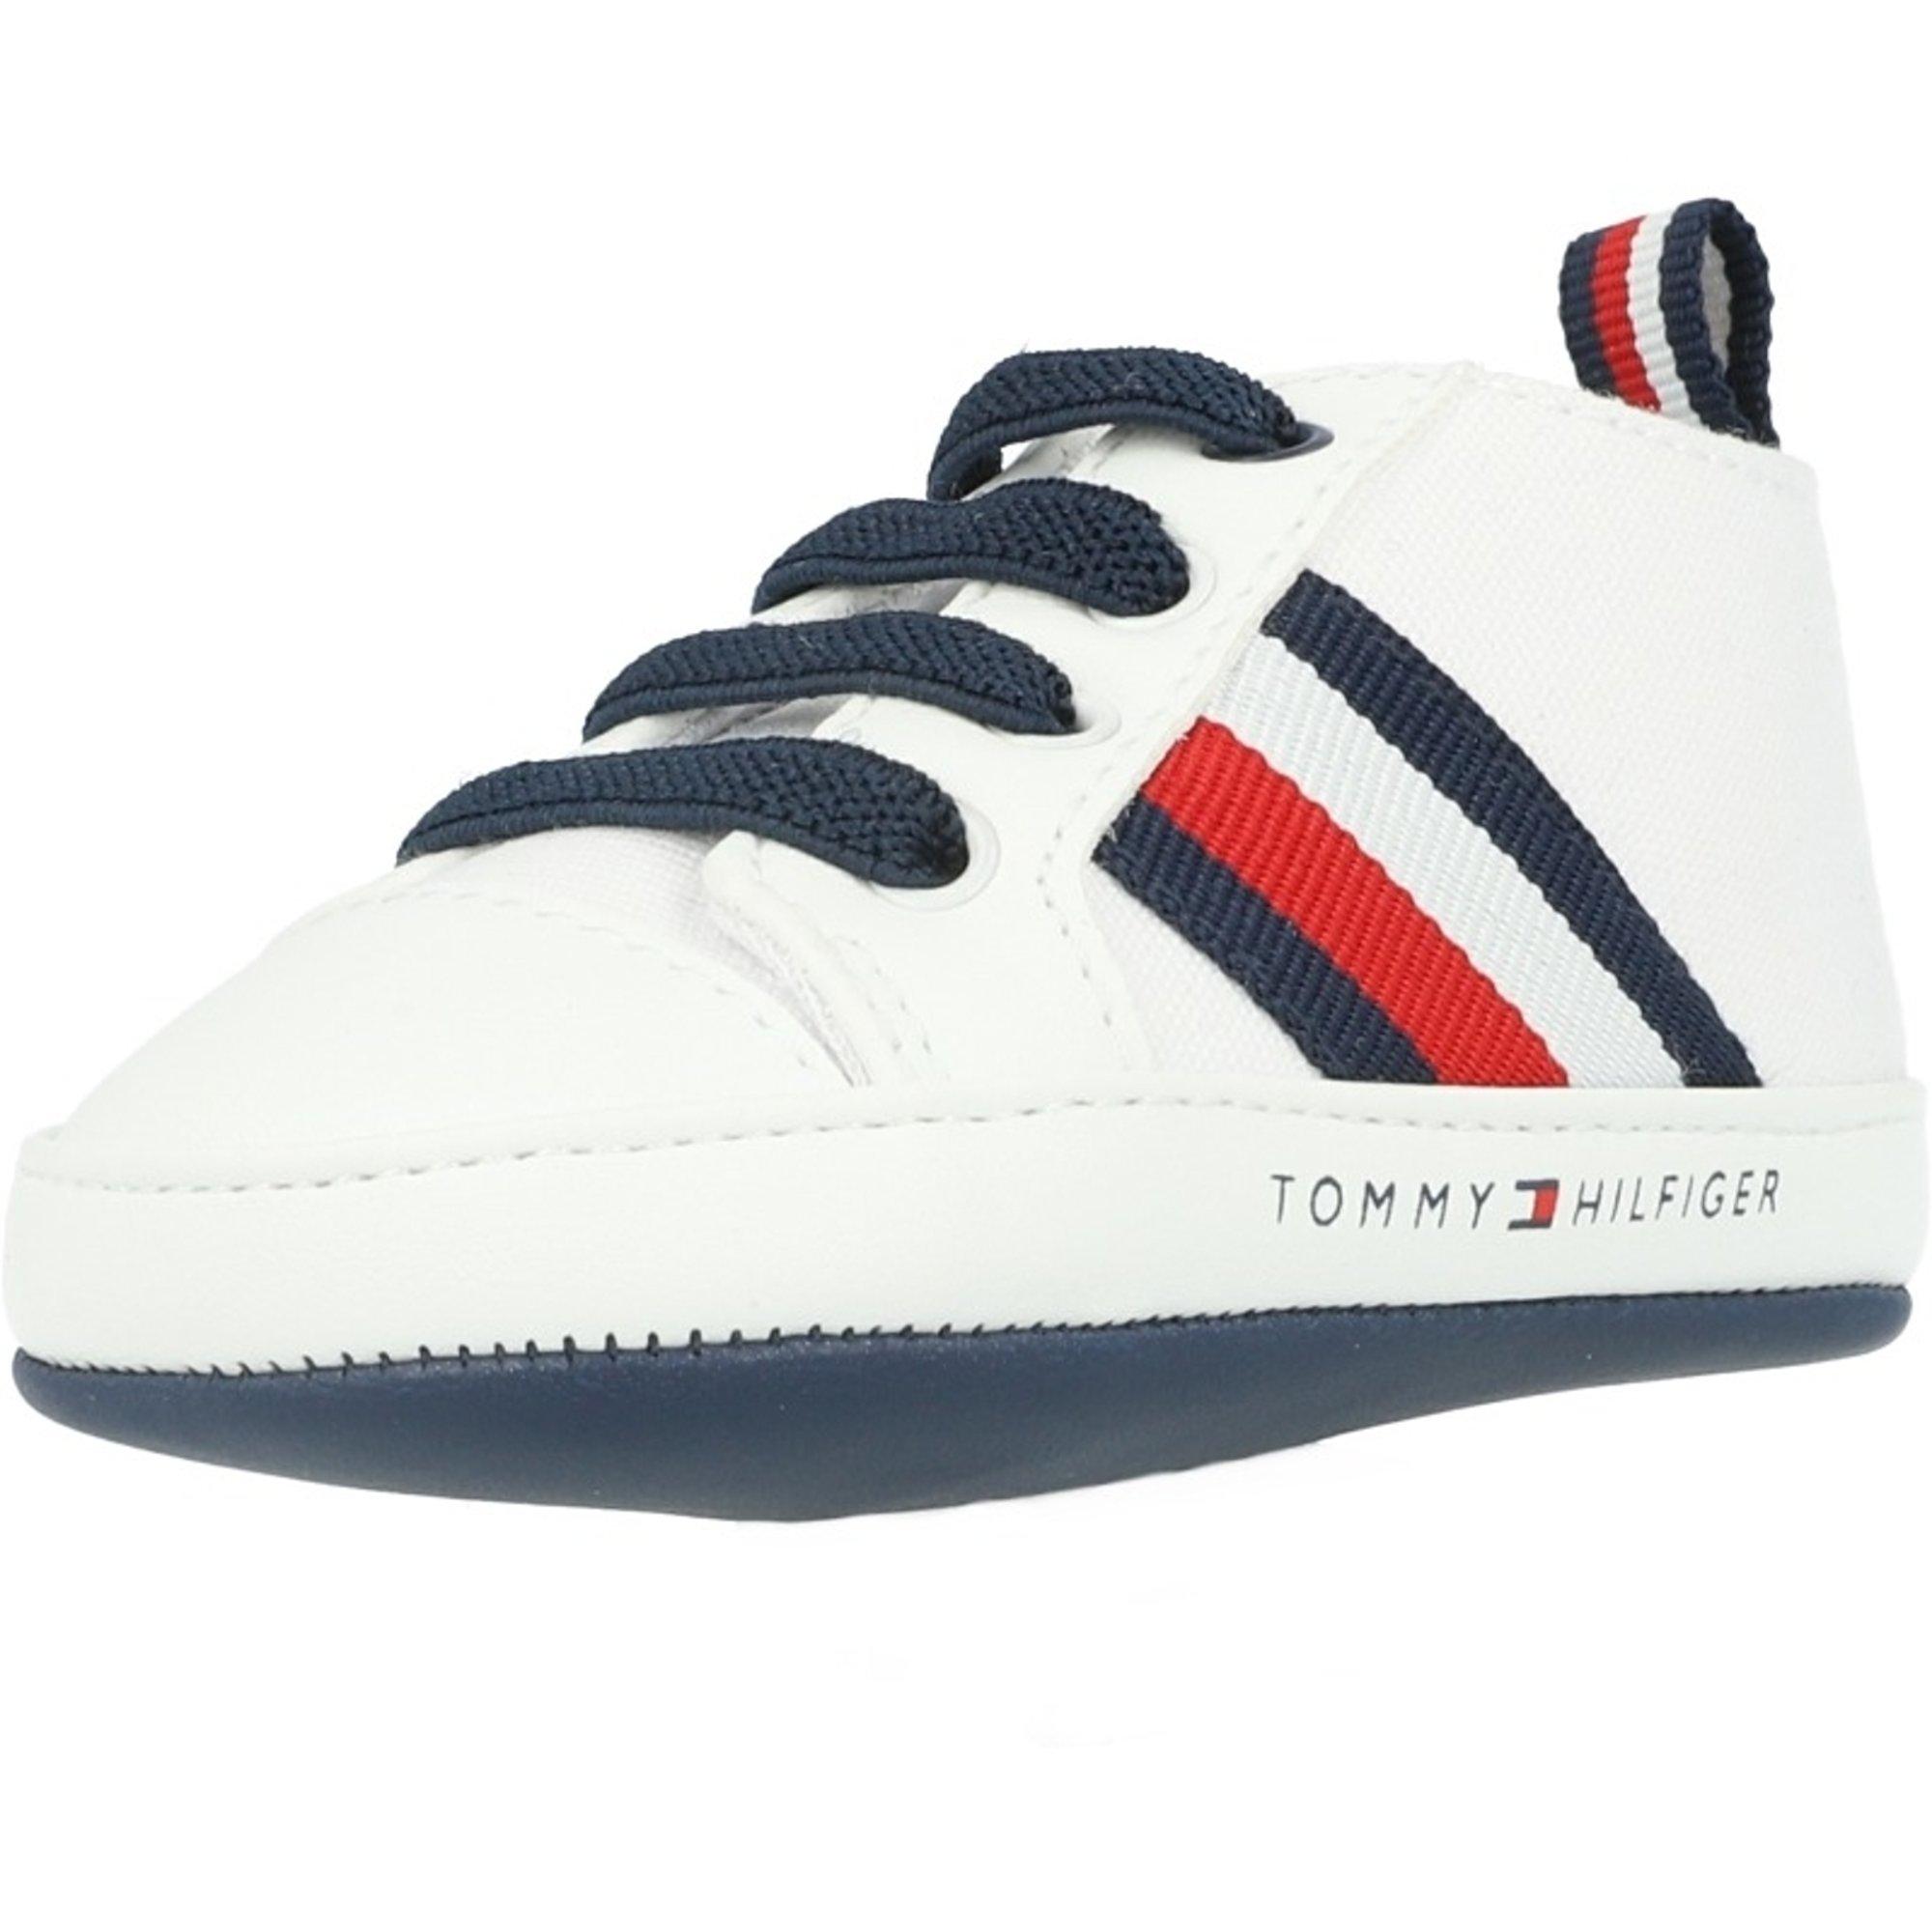 Tommy Hilfiger Crib White Textile